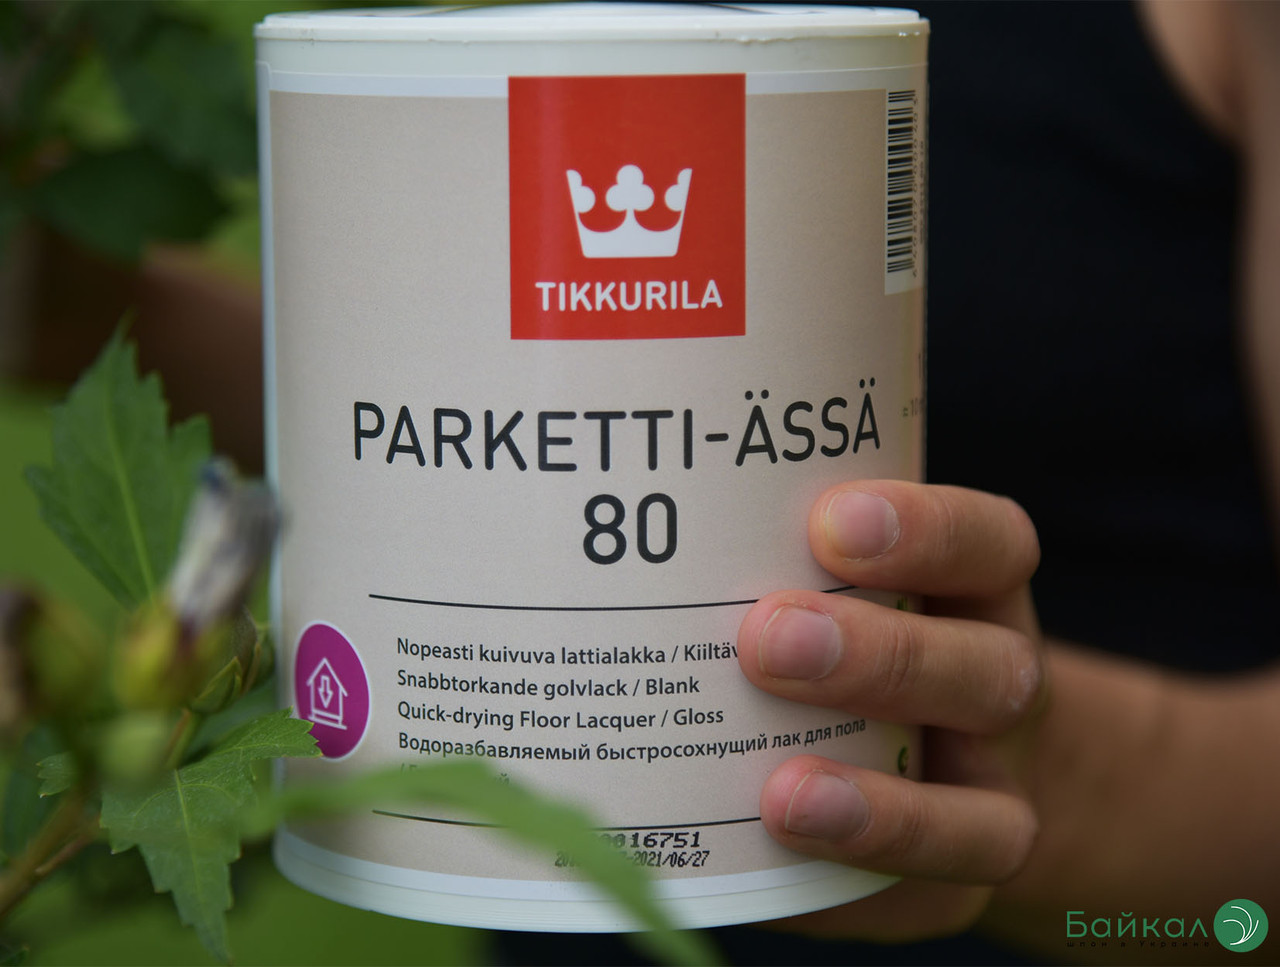 Глянцевый лак для пола Parketti Assa 80 – Tikkurila (банка 0,9 л)